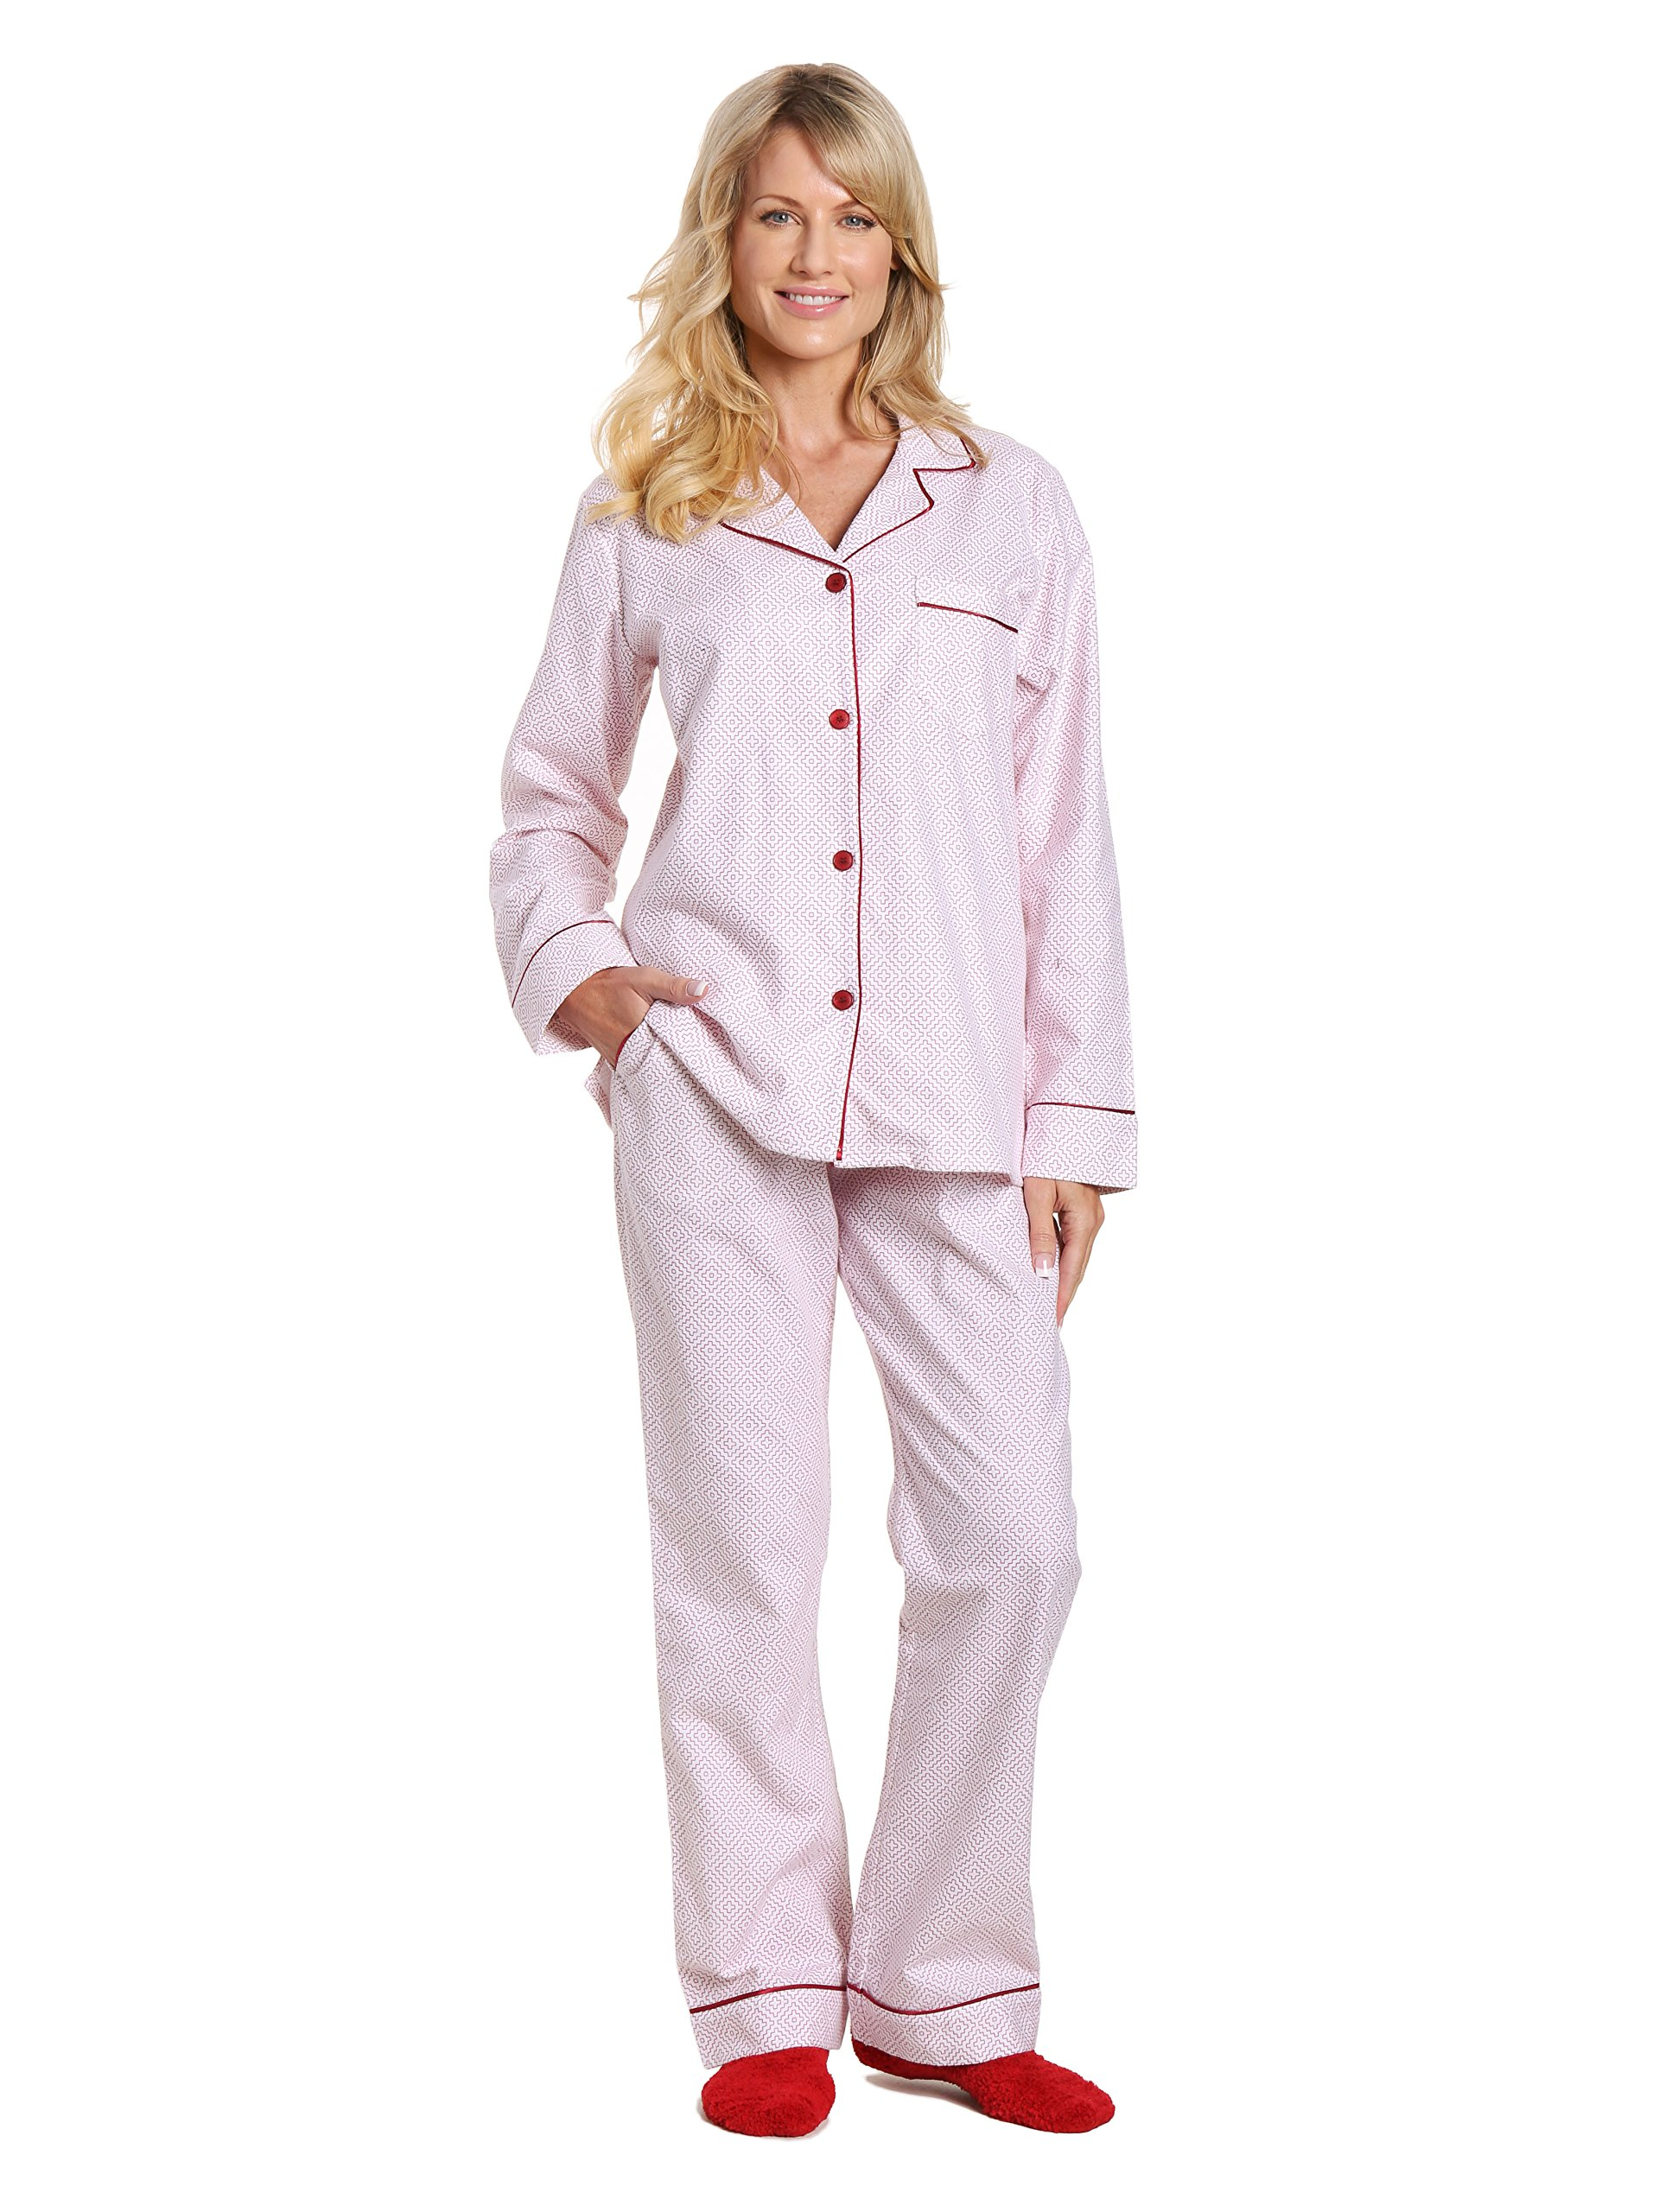 comforter polka pajamas secret dot pyjamas comfortable pinterest pyjama sam women pin most classic